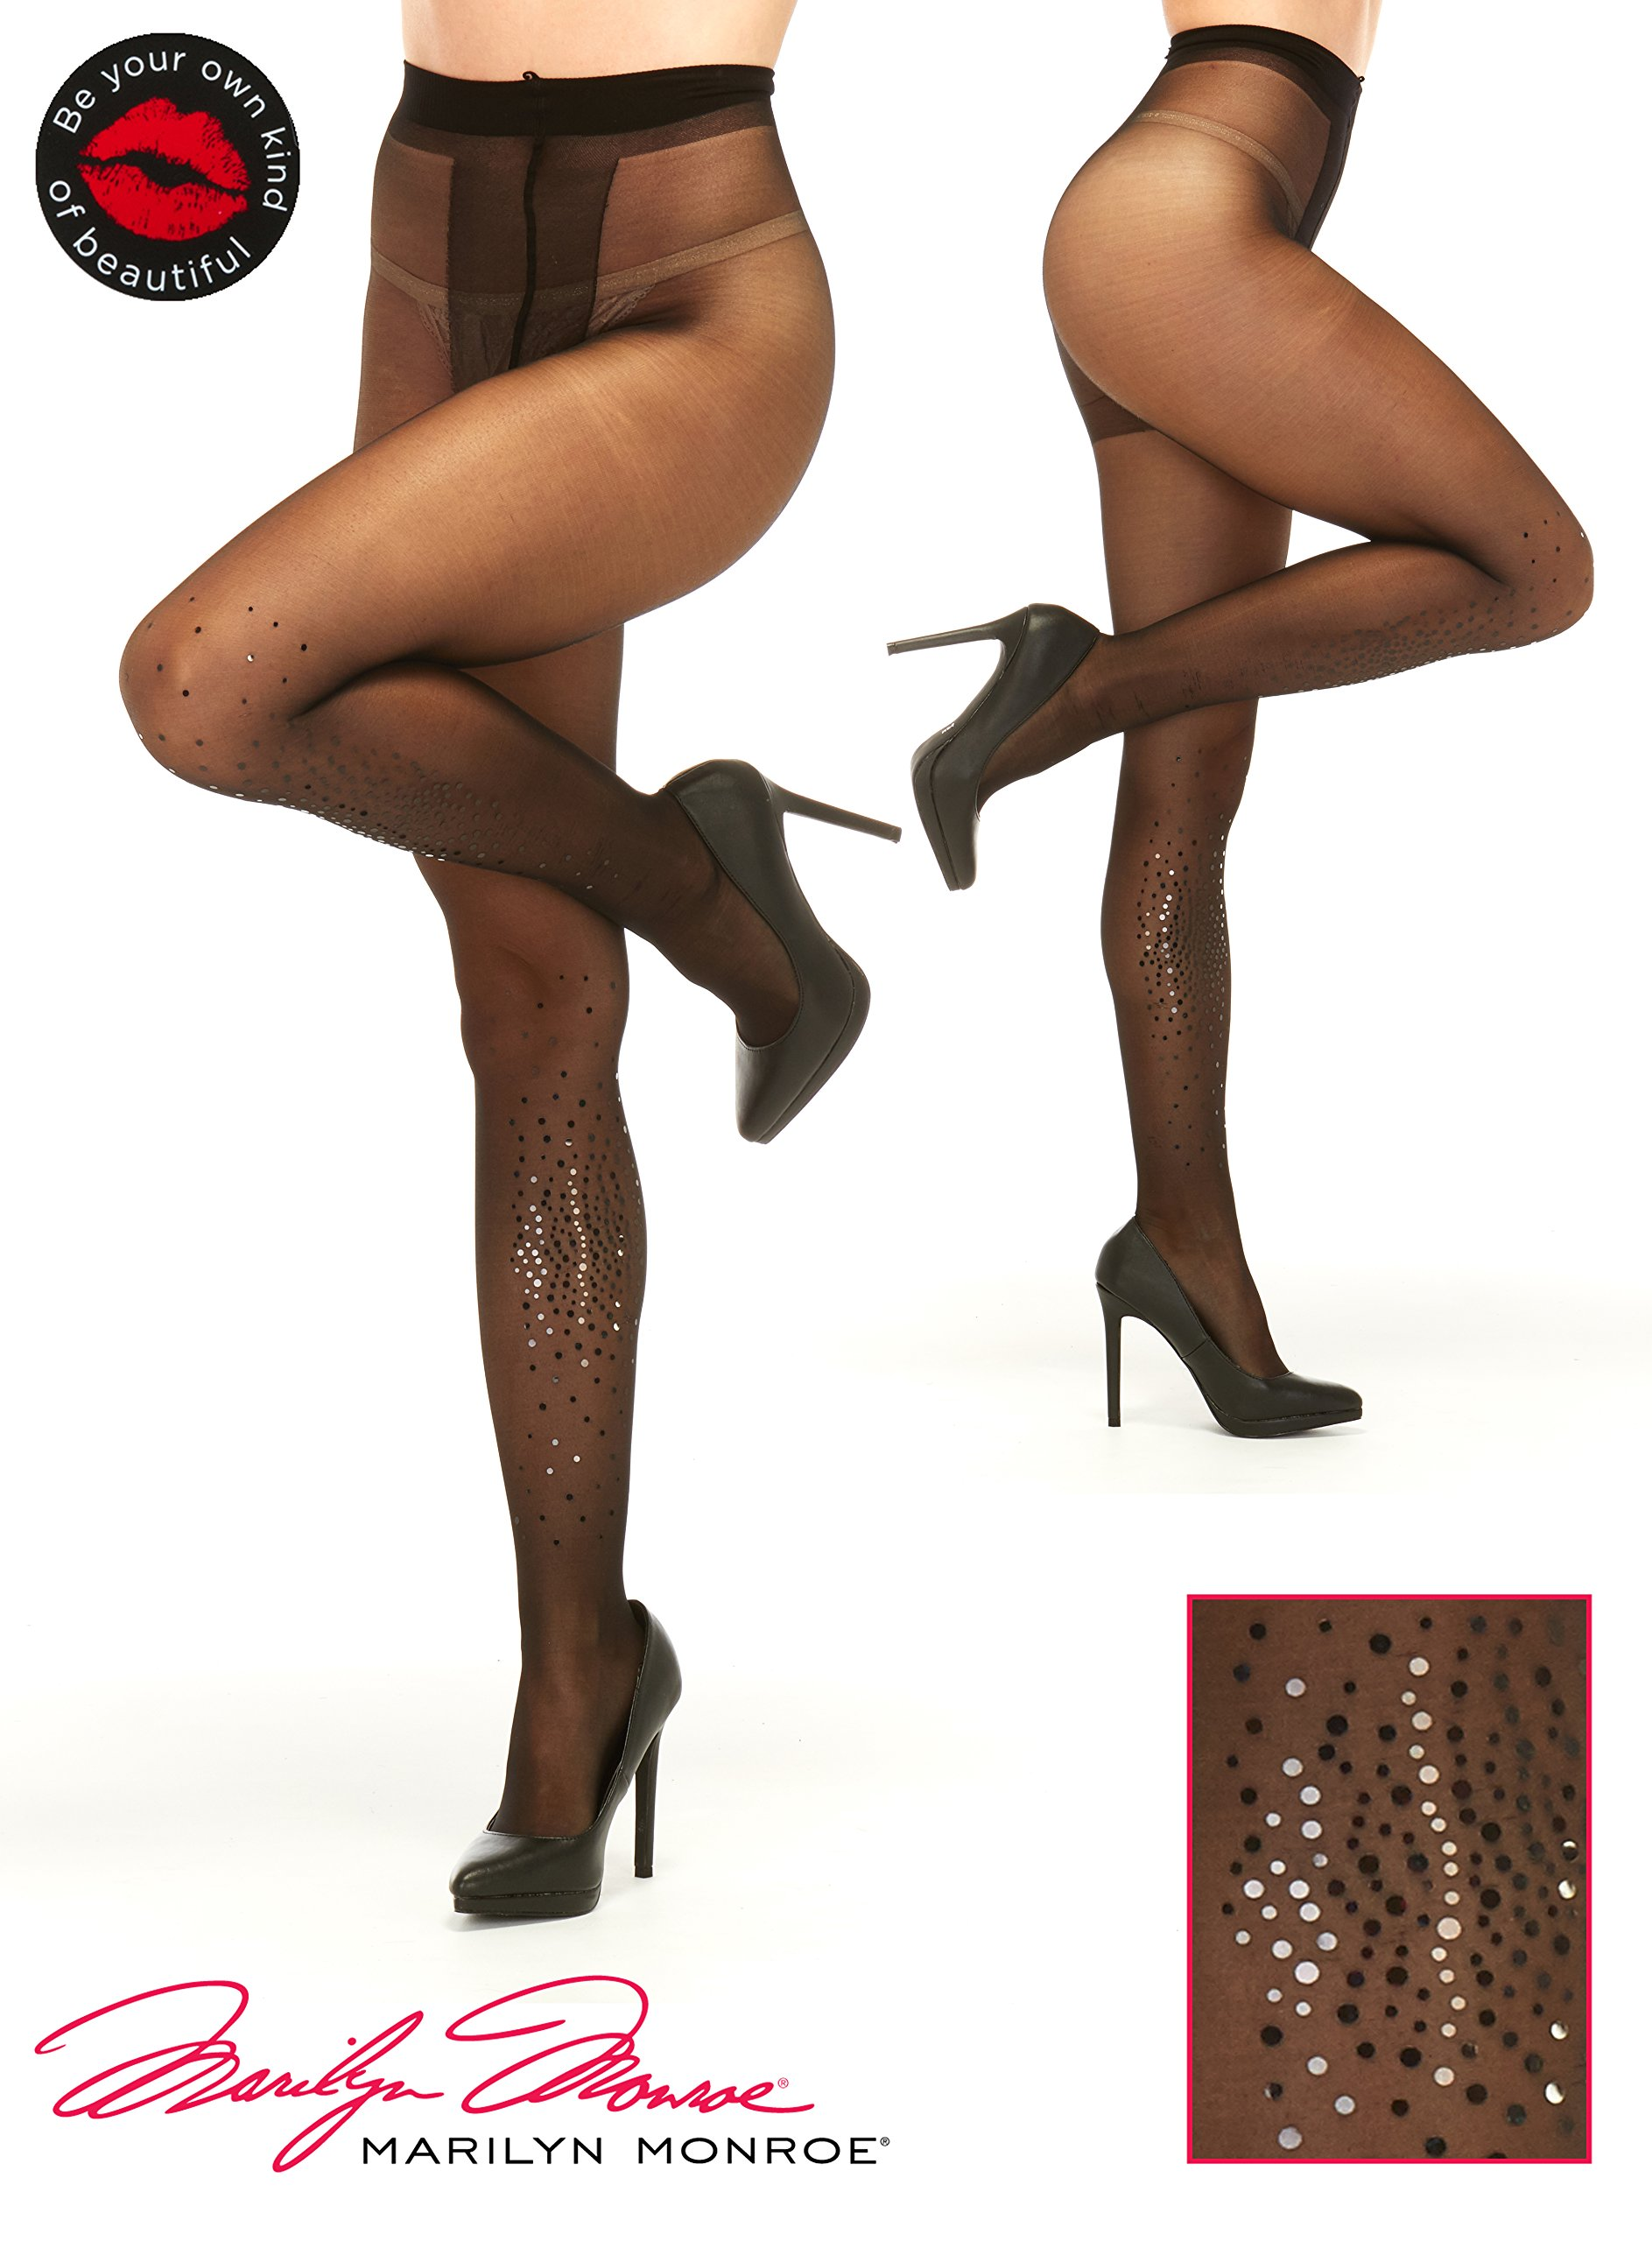 Marilyn Monroe Women Fashion Sheer Pantyhose Tights Stockings With Black Rhinestones size C Black